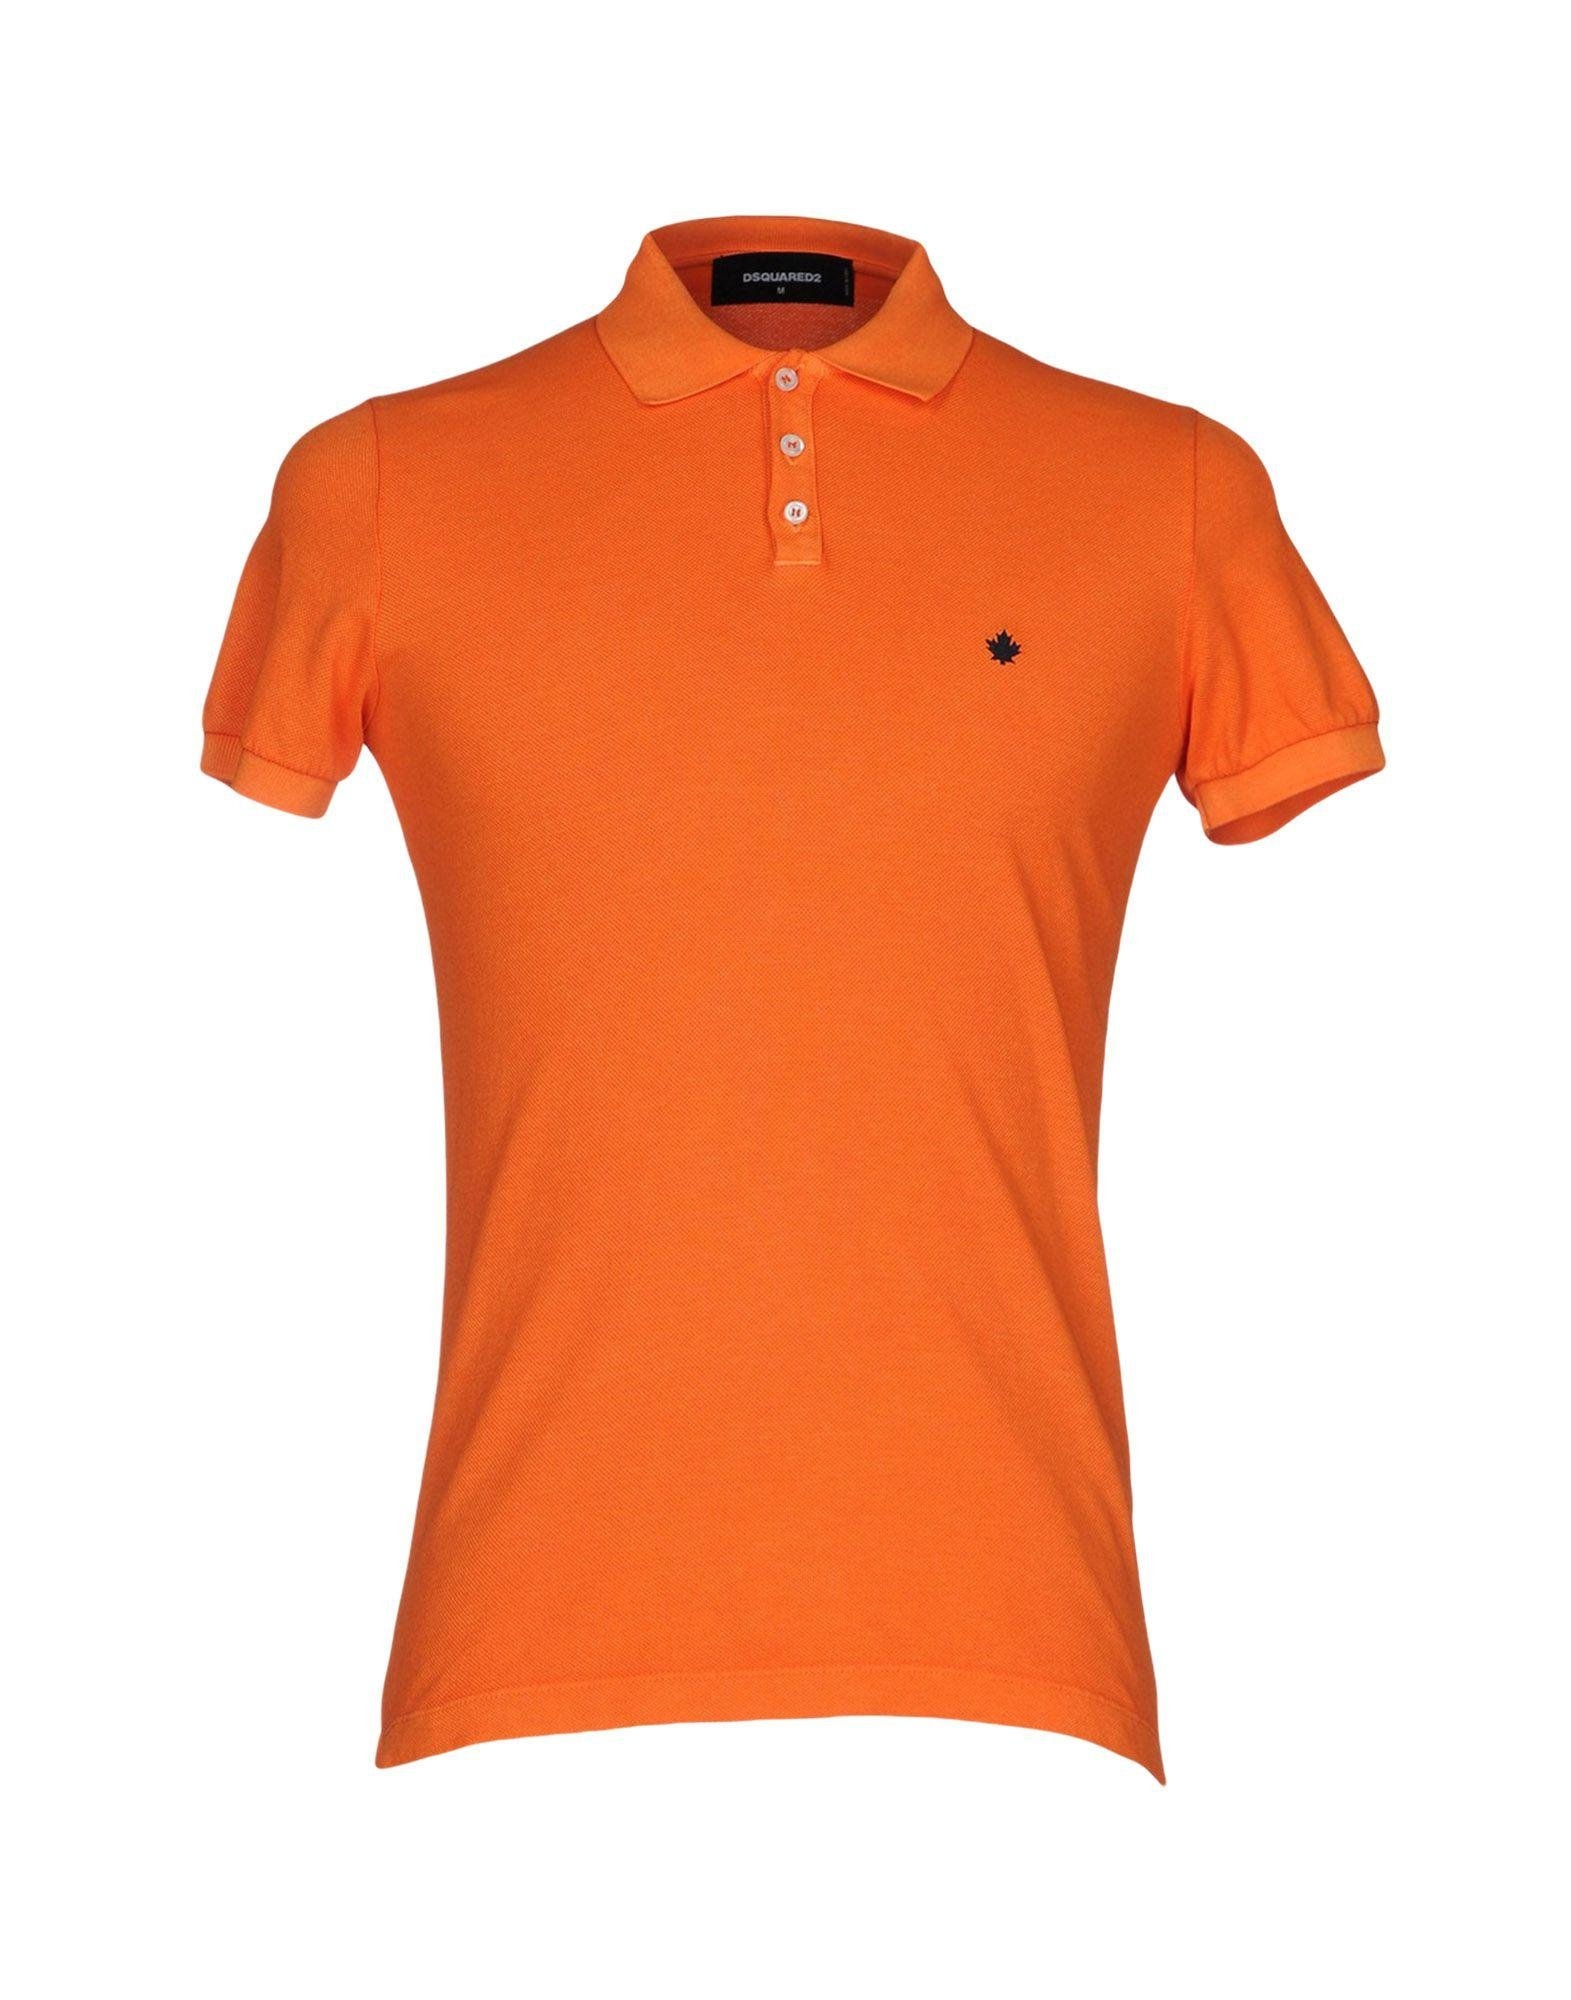 Dsquared polo shirt in orange for men lyst for Orange polo shirt mens